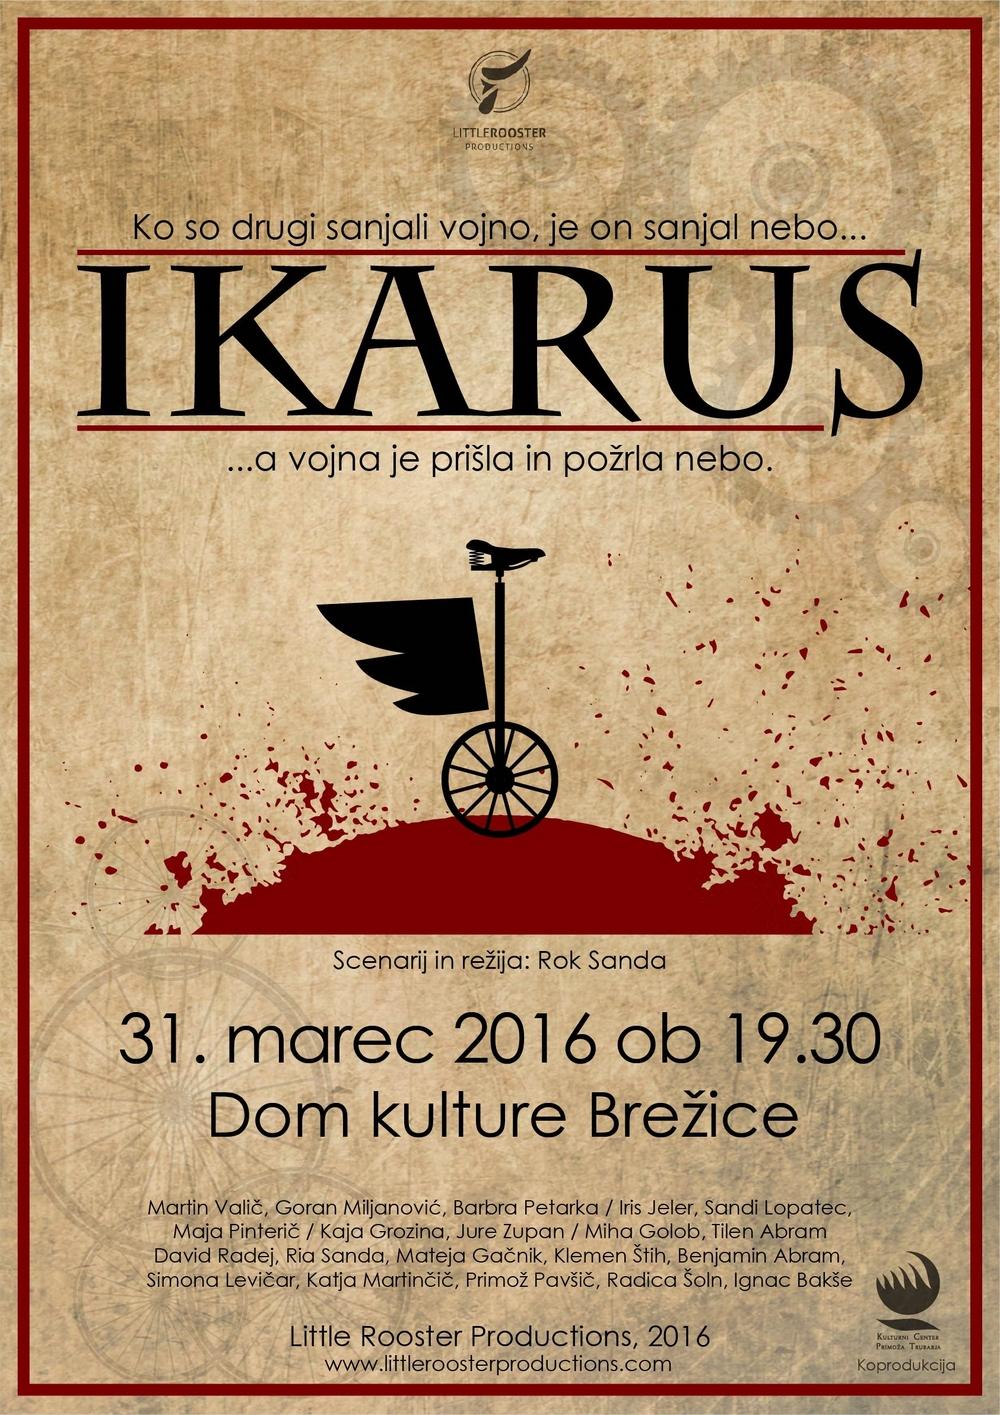 Ikarus Plakat Brežice.jpg